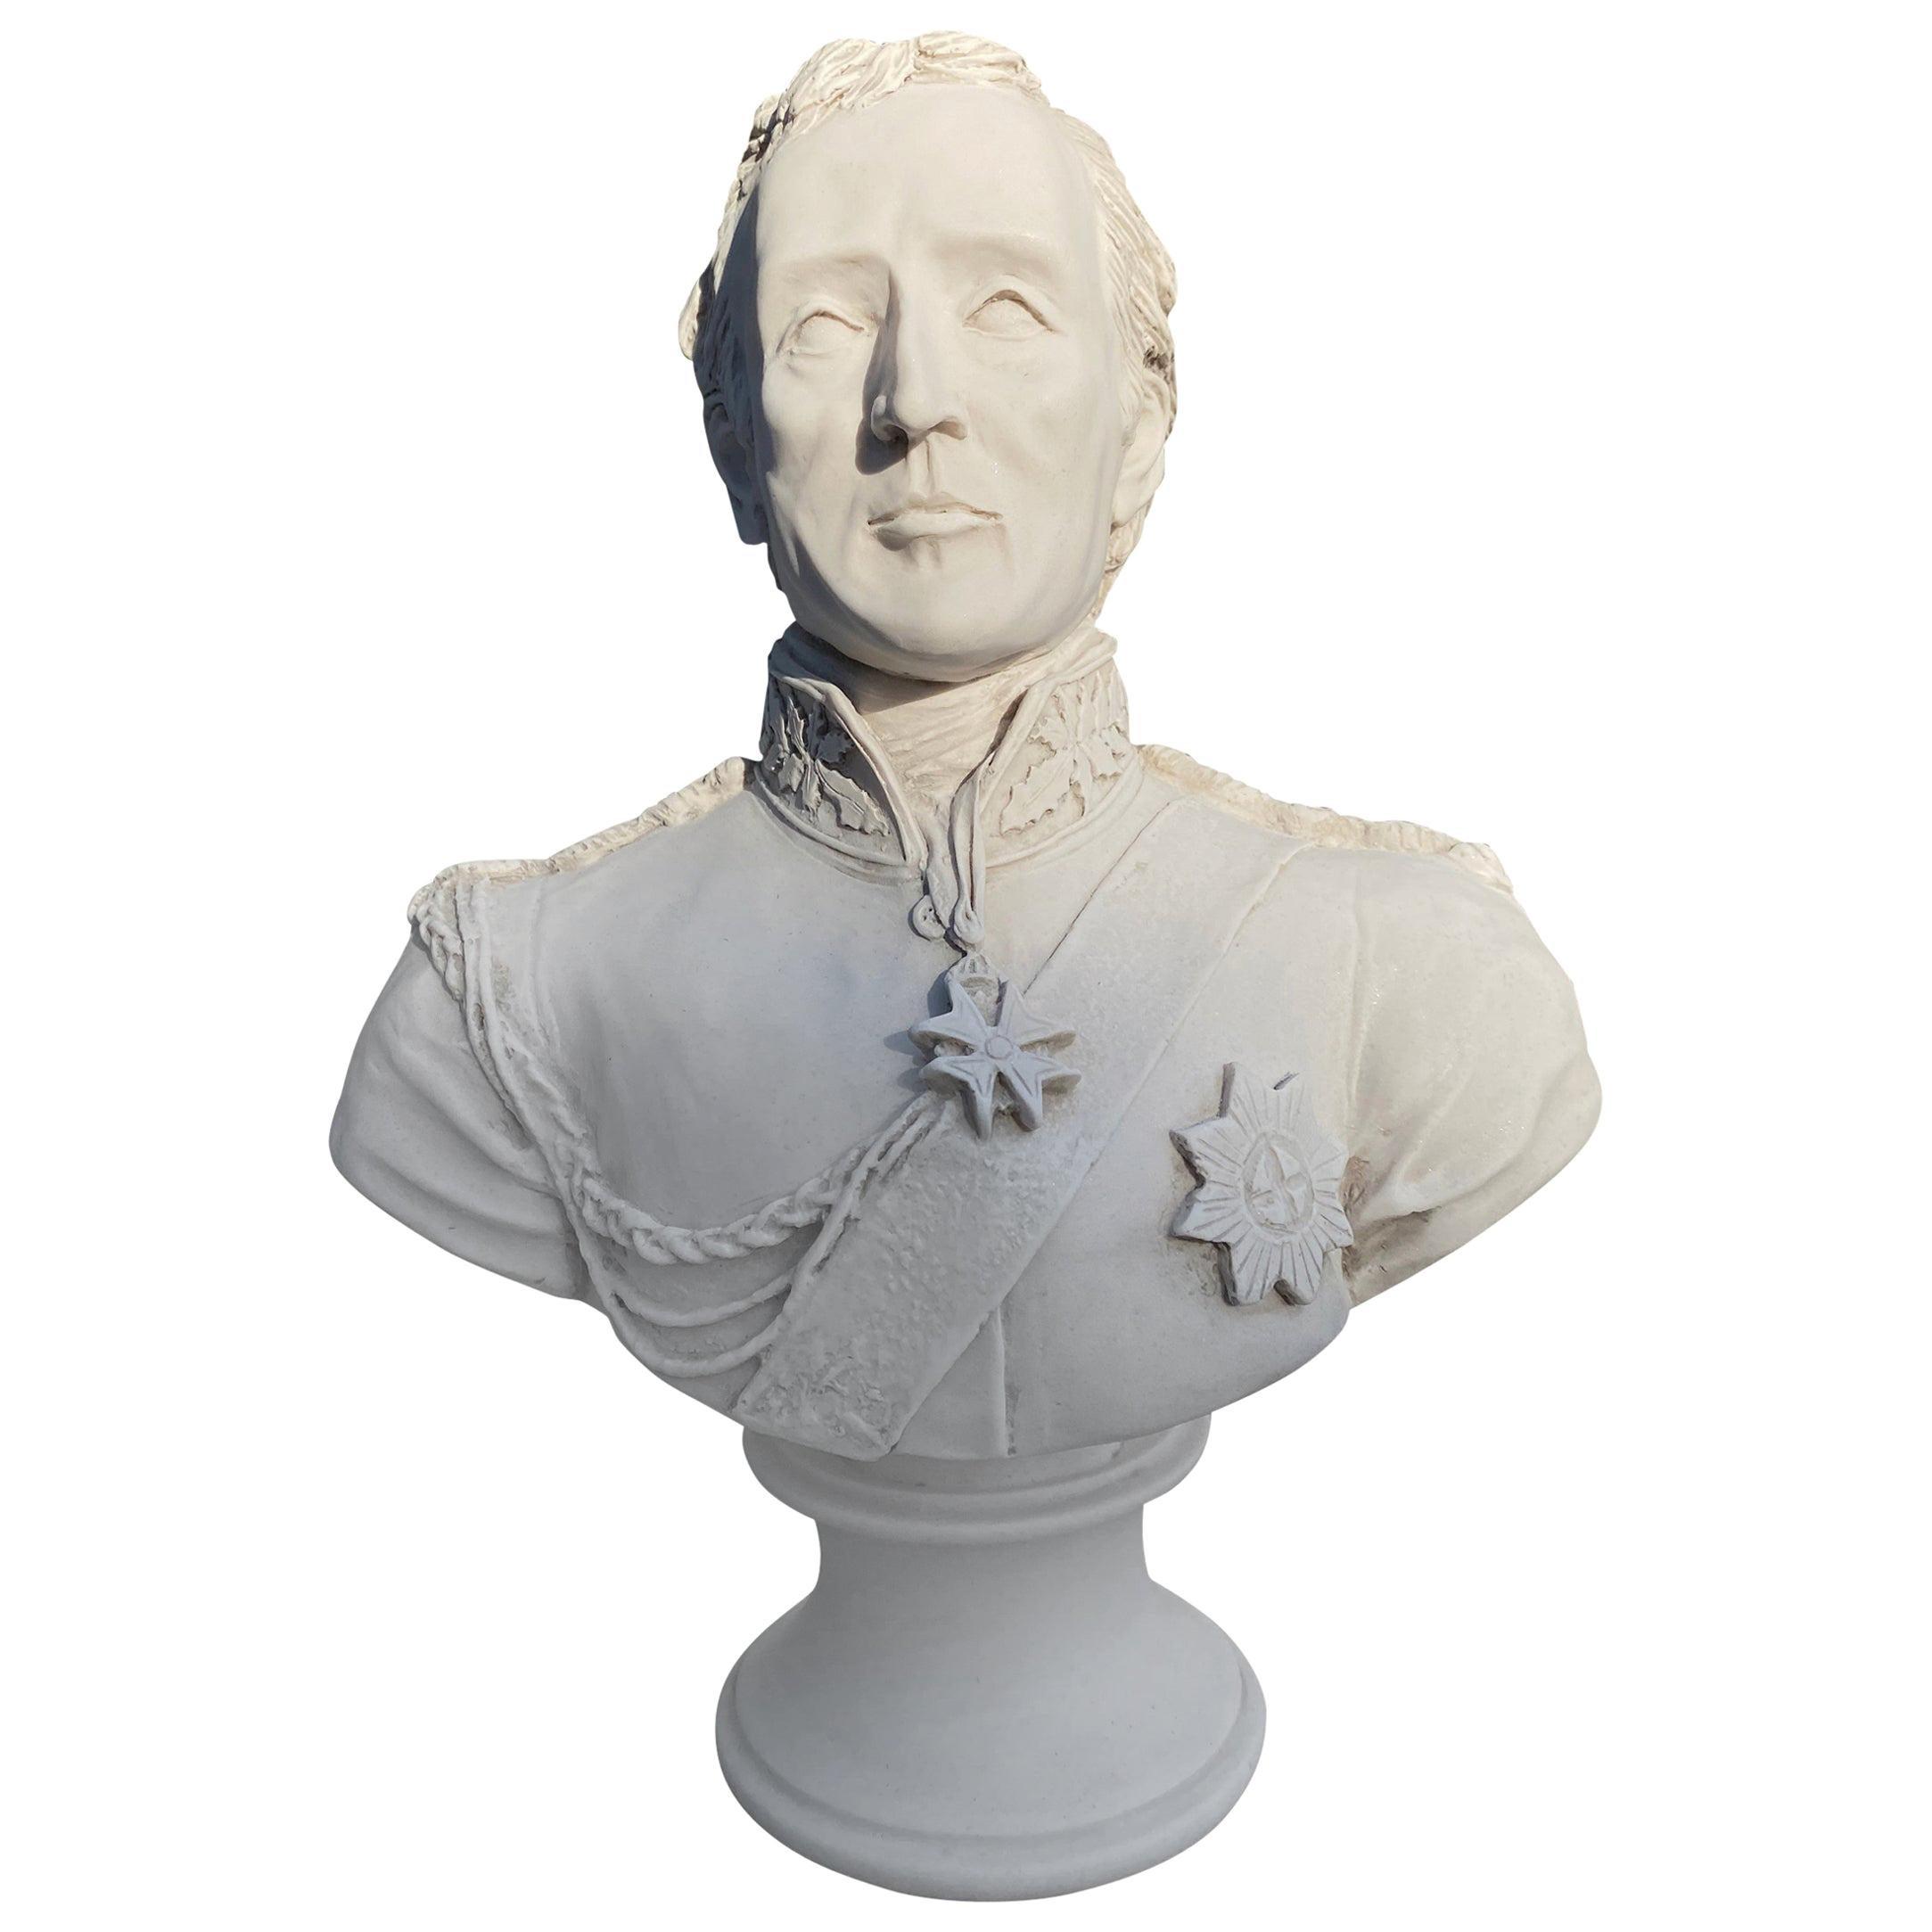 Arthur Wellesley, 1st Duke of Wellington Bust Sculpture, 20th Century